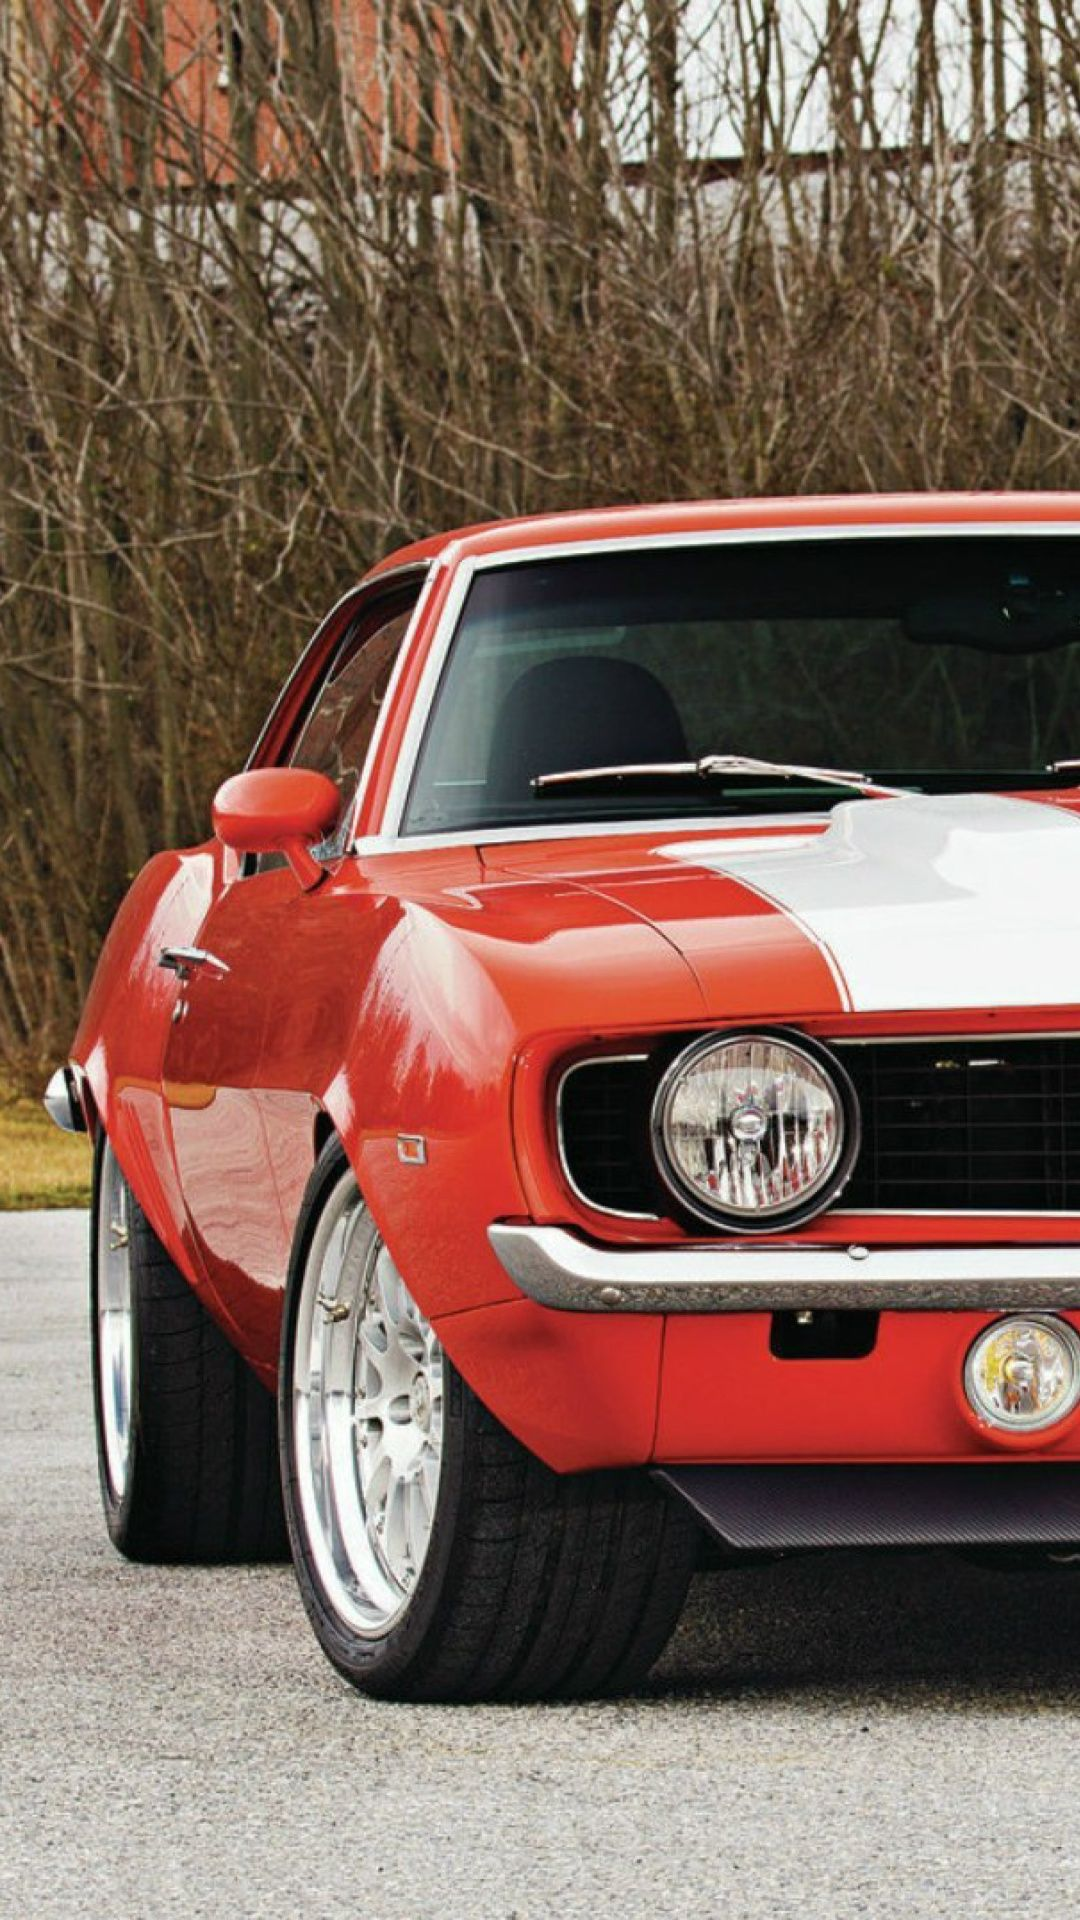 Chevy Camaro 1969 Z28 Wallpaper